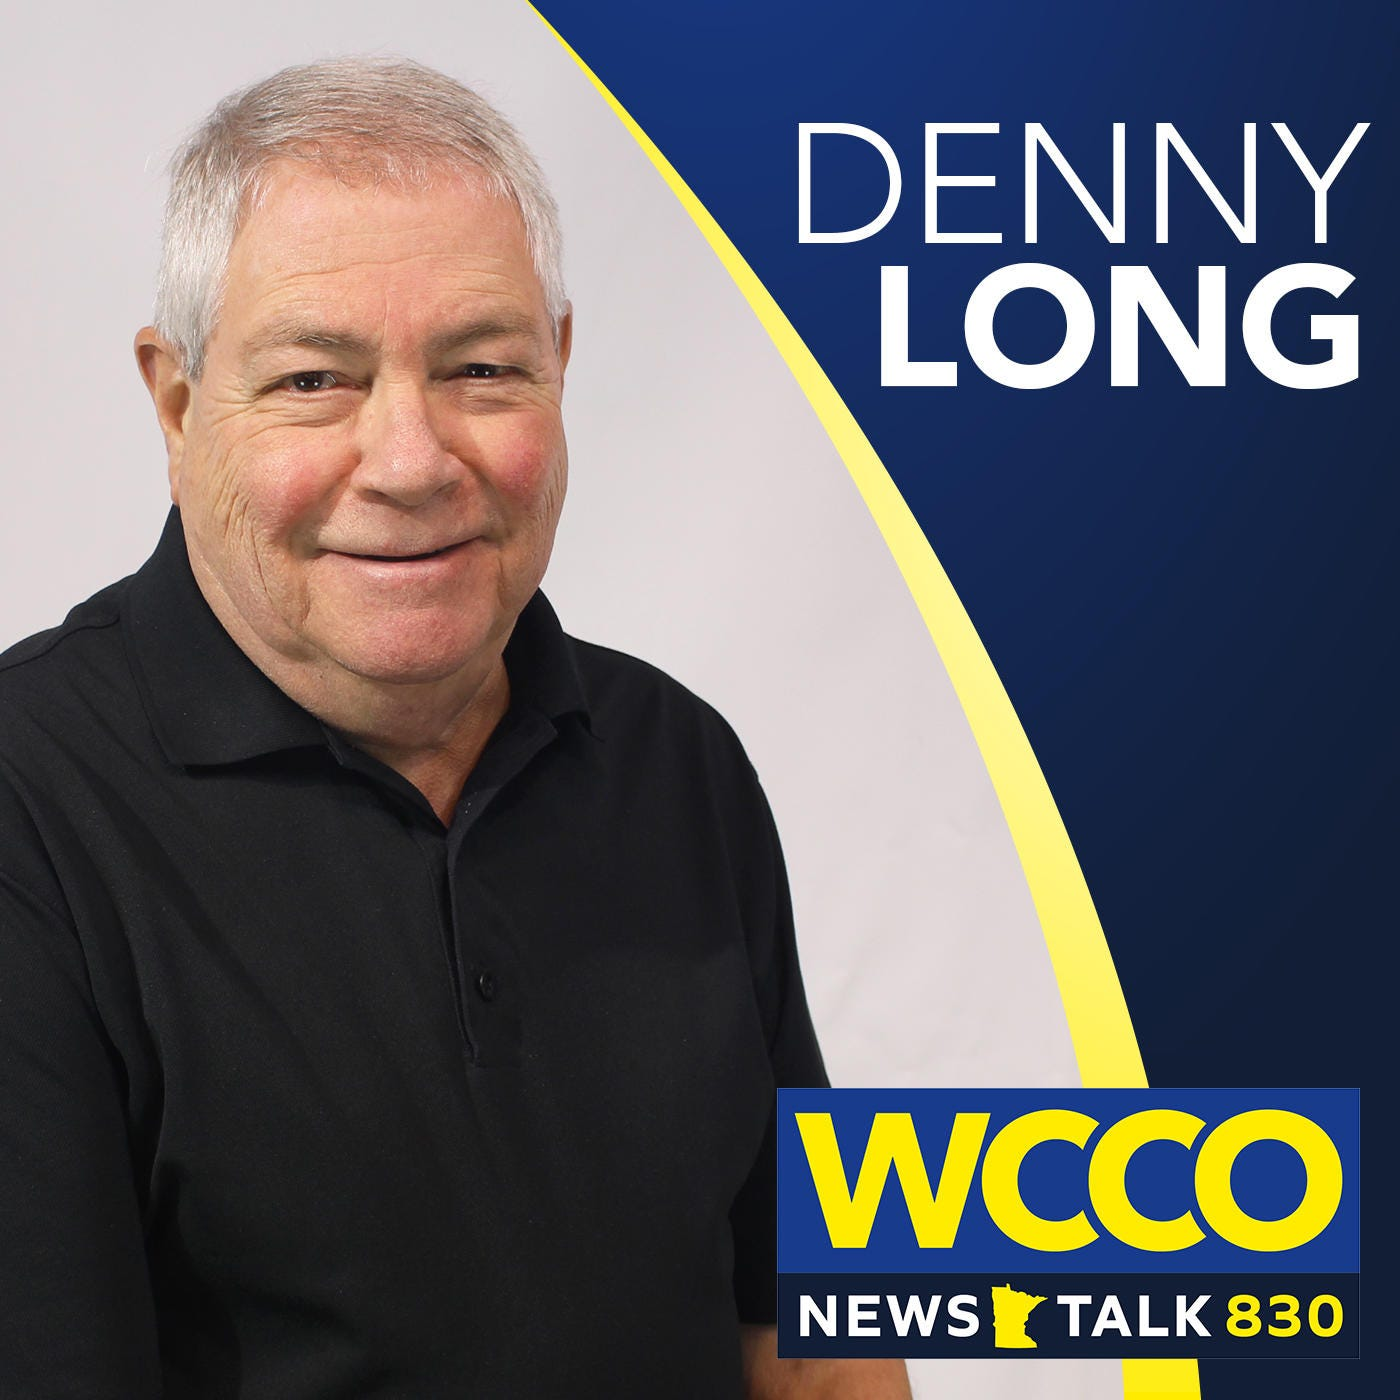 Denny Long